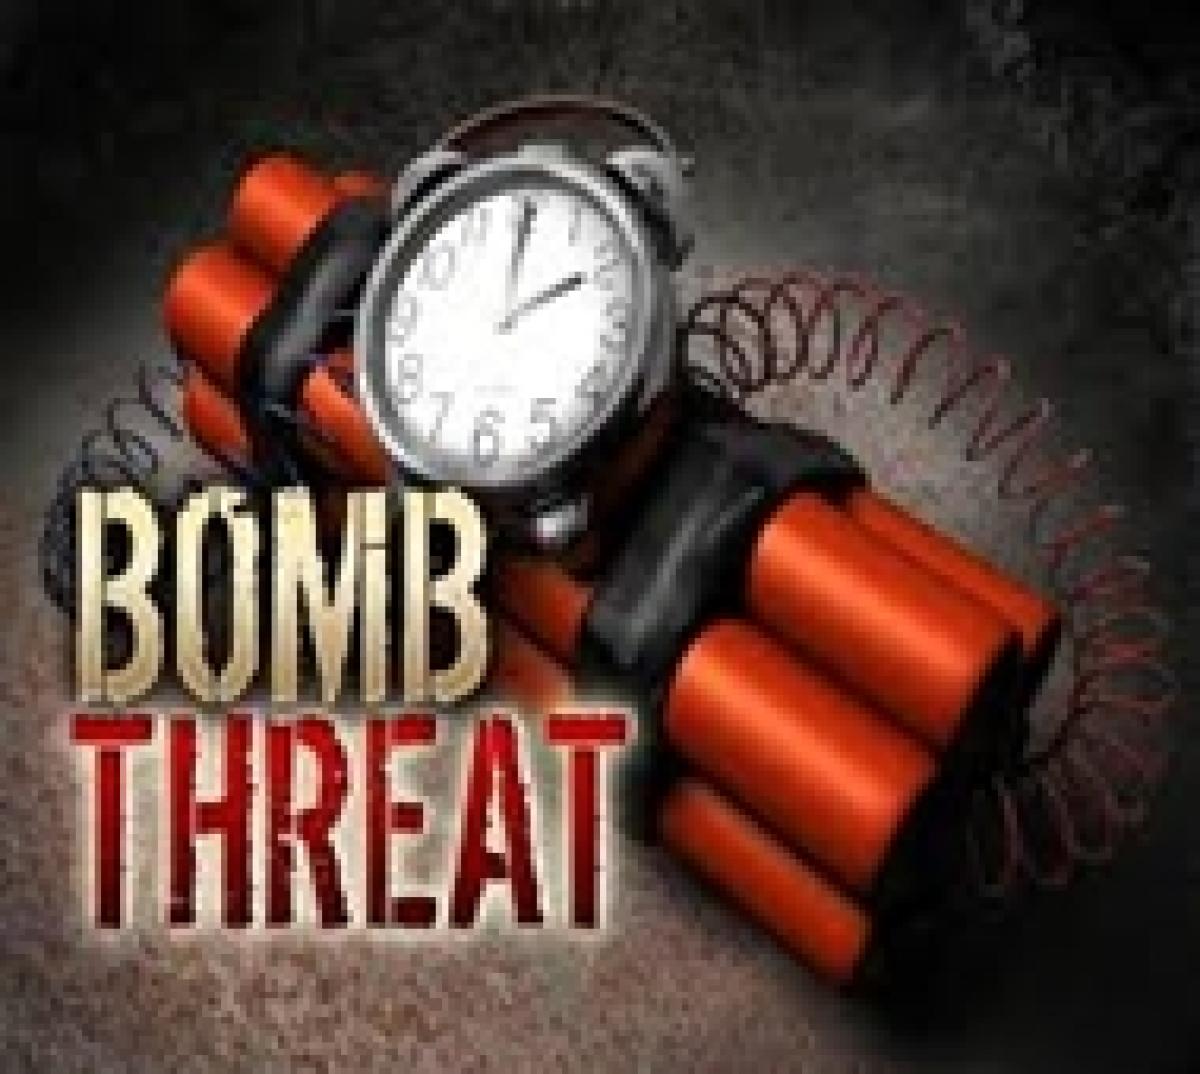 Medicos, staff protest bomb threat in Imphal medical institute